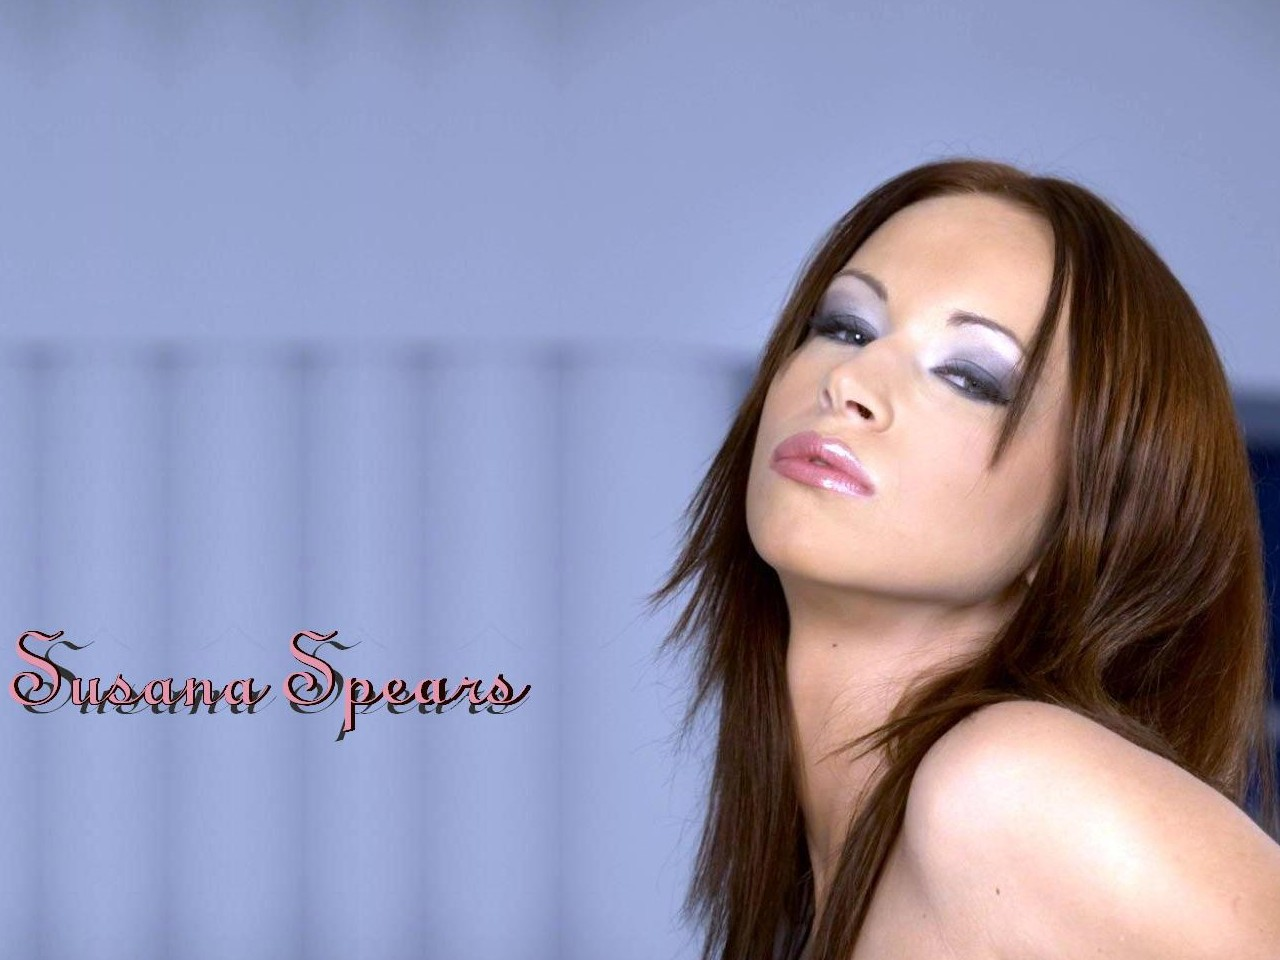 Zuzana Spears Sex 36